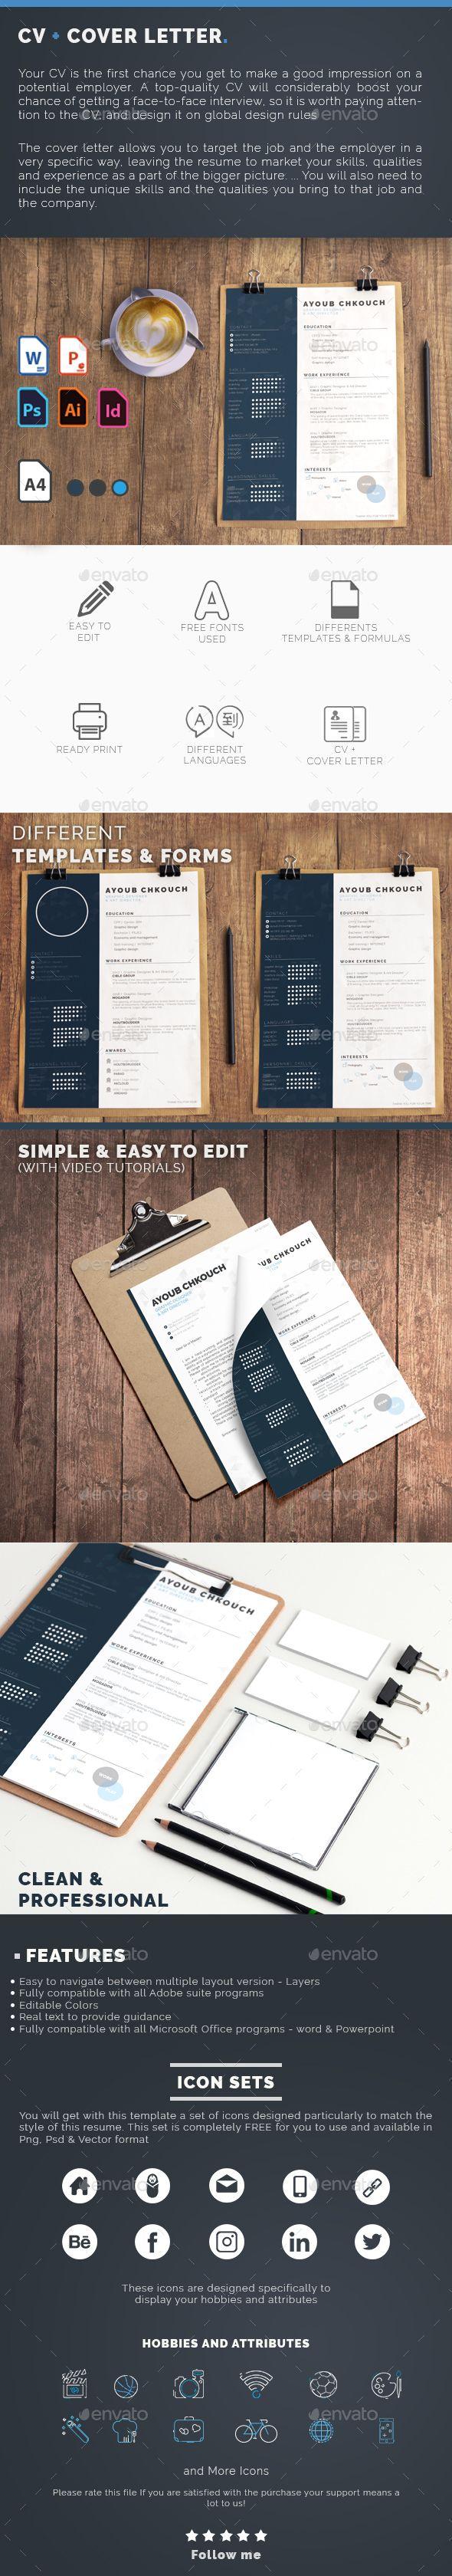 CV Cover letter Multi Language Word